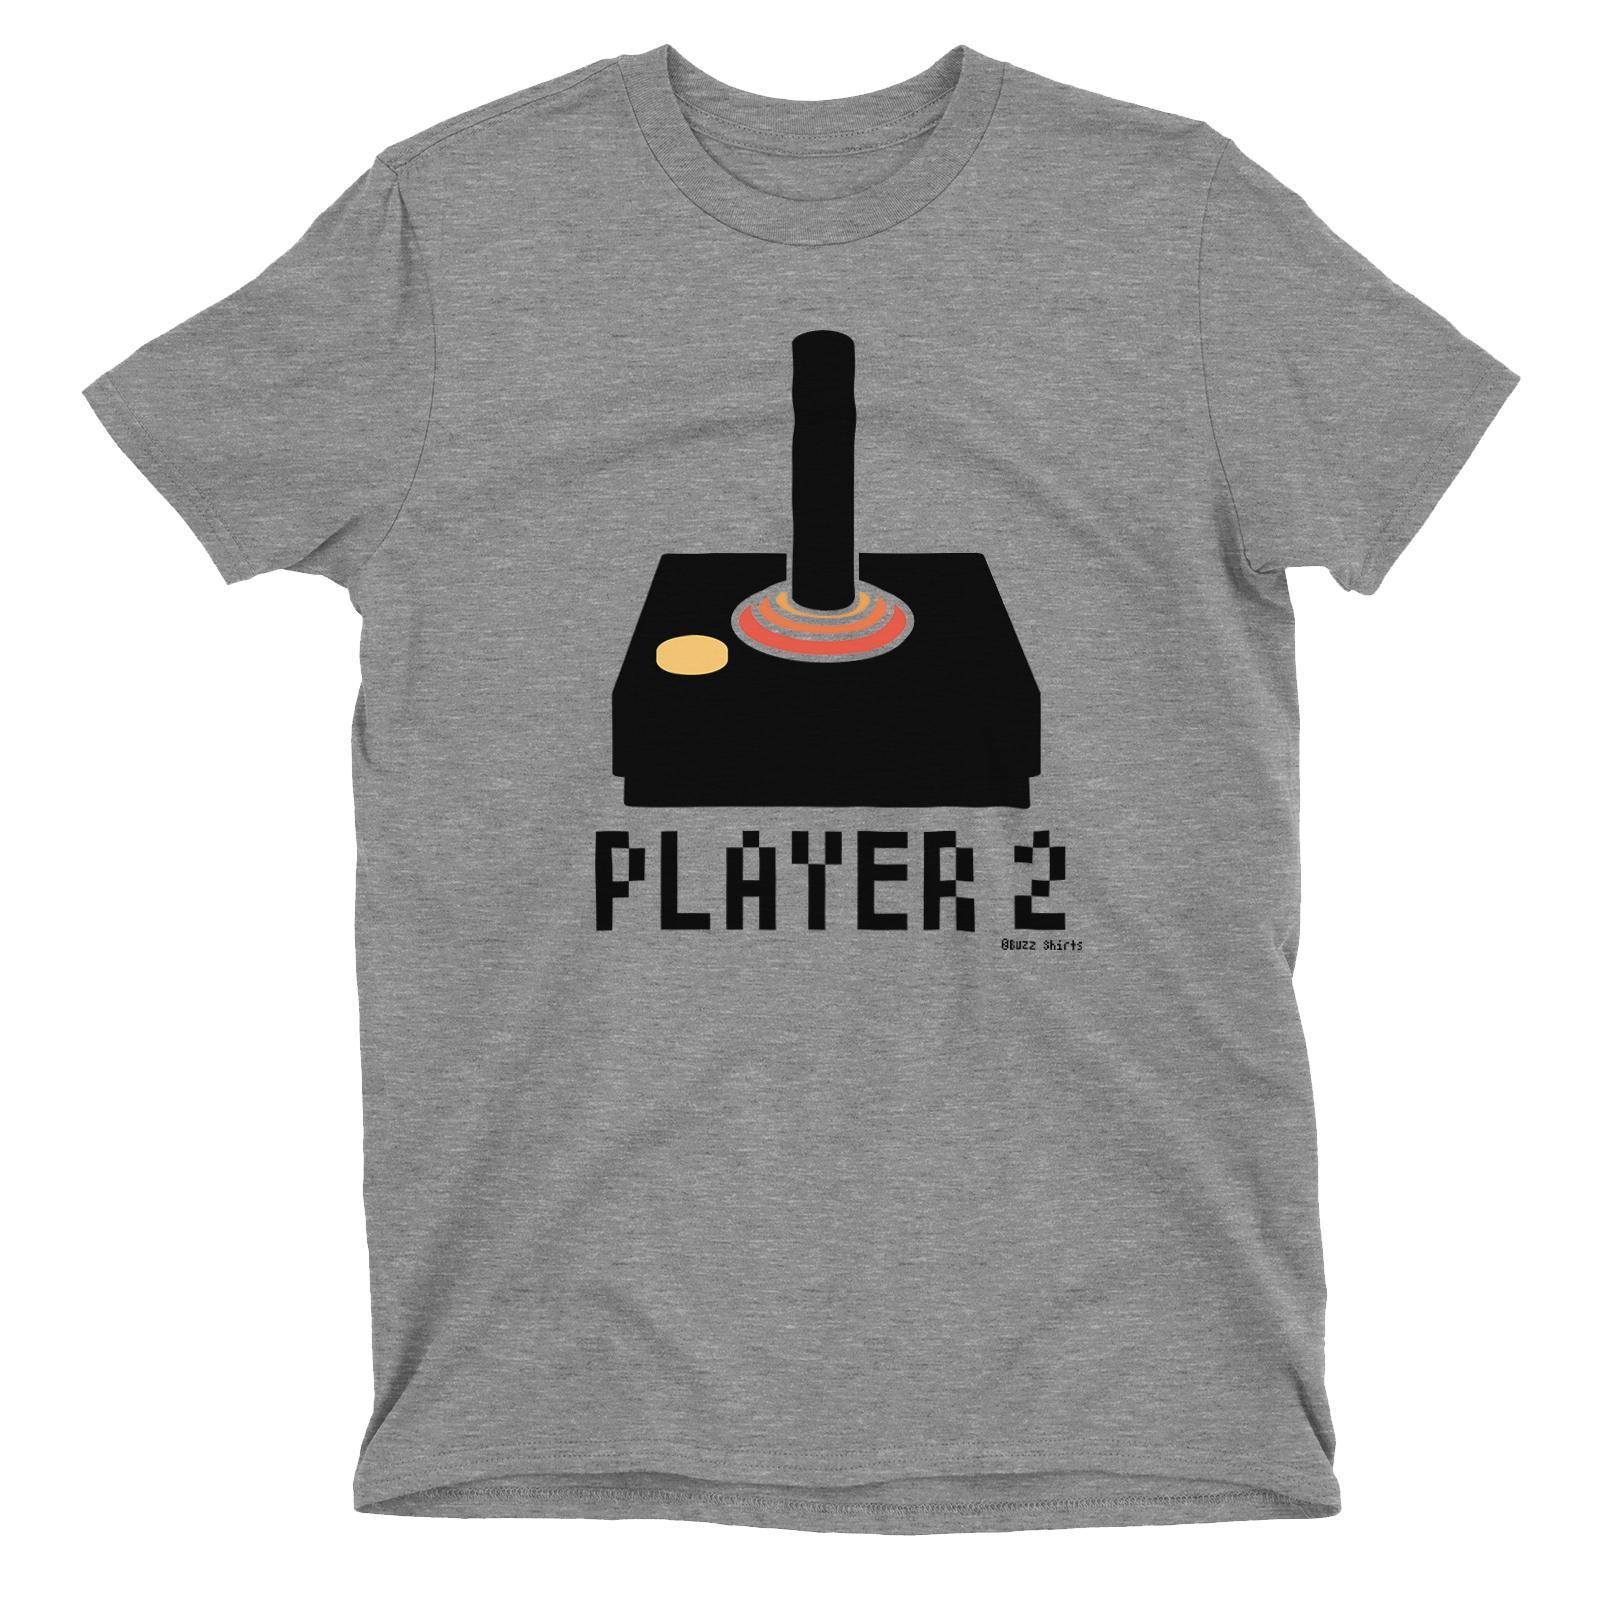 Player 1 2 3 4 Retro Joystick Matching T-Shirt Dad Mum Boy Girl Baby Classic Quality High t-shirt